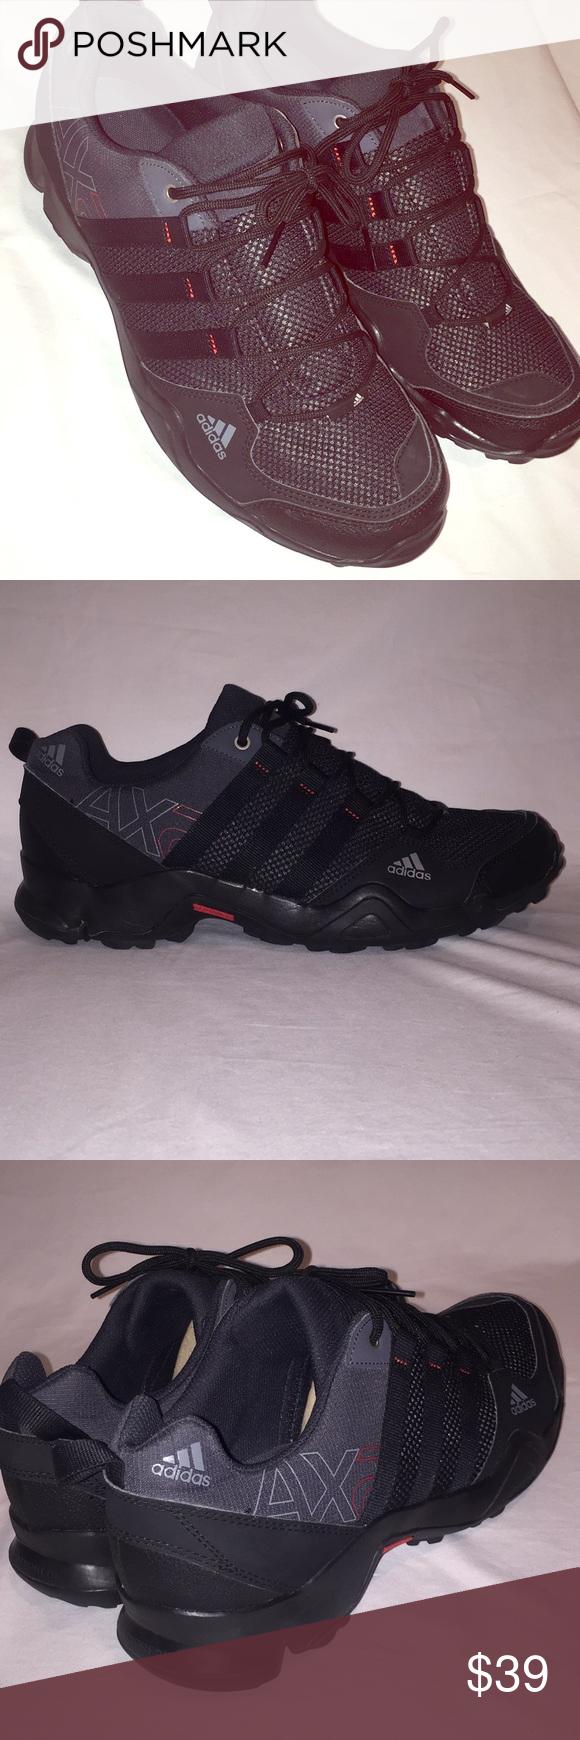 Men's Adidas Traxion AX2 Hiking Shoes